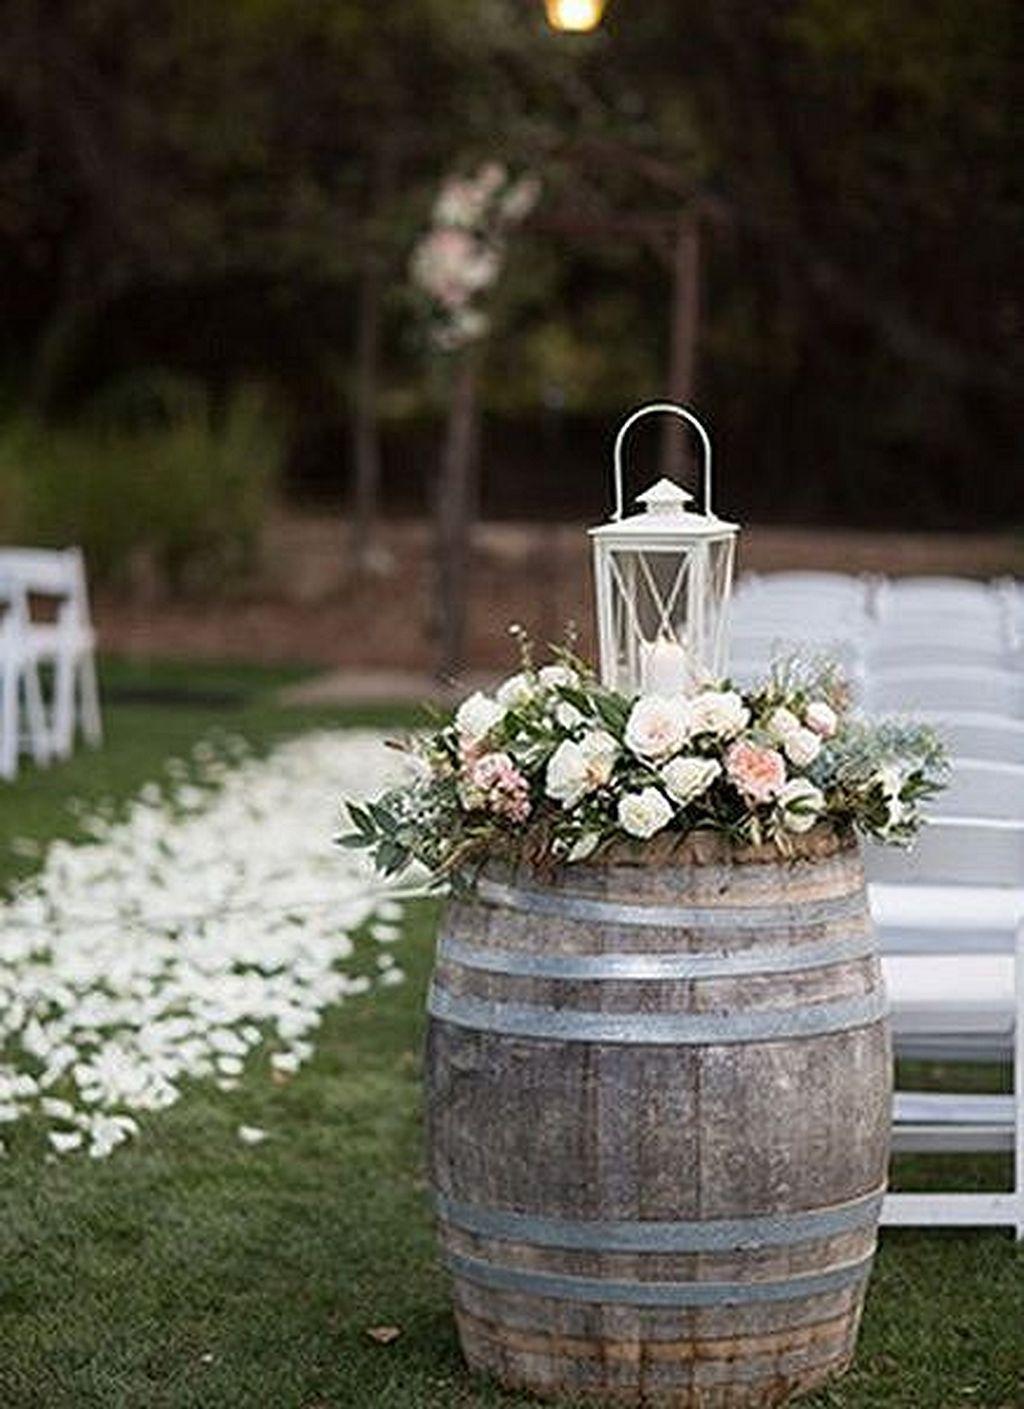 Outdoor wedding ideas 126 Country wedding decorations